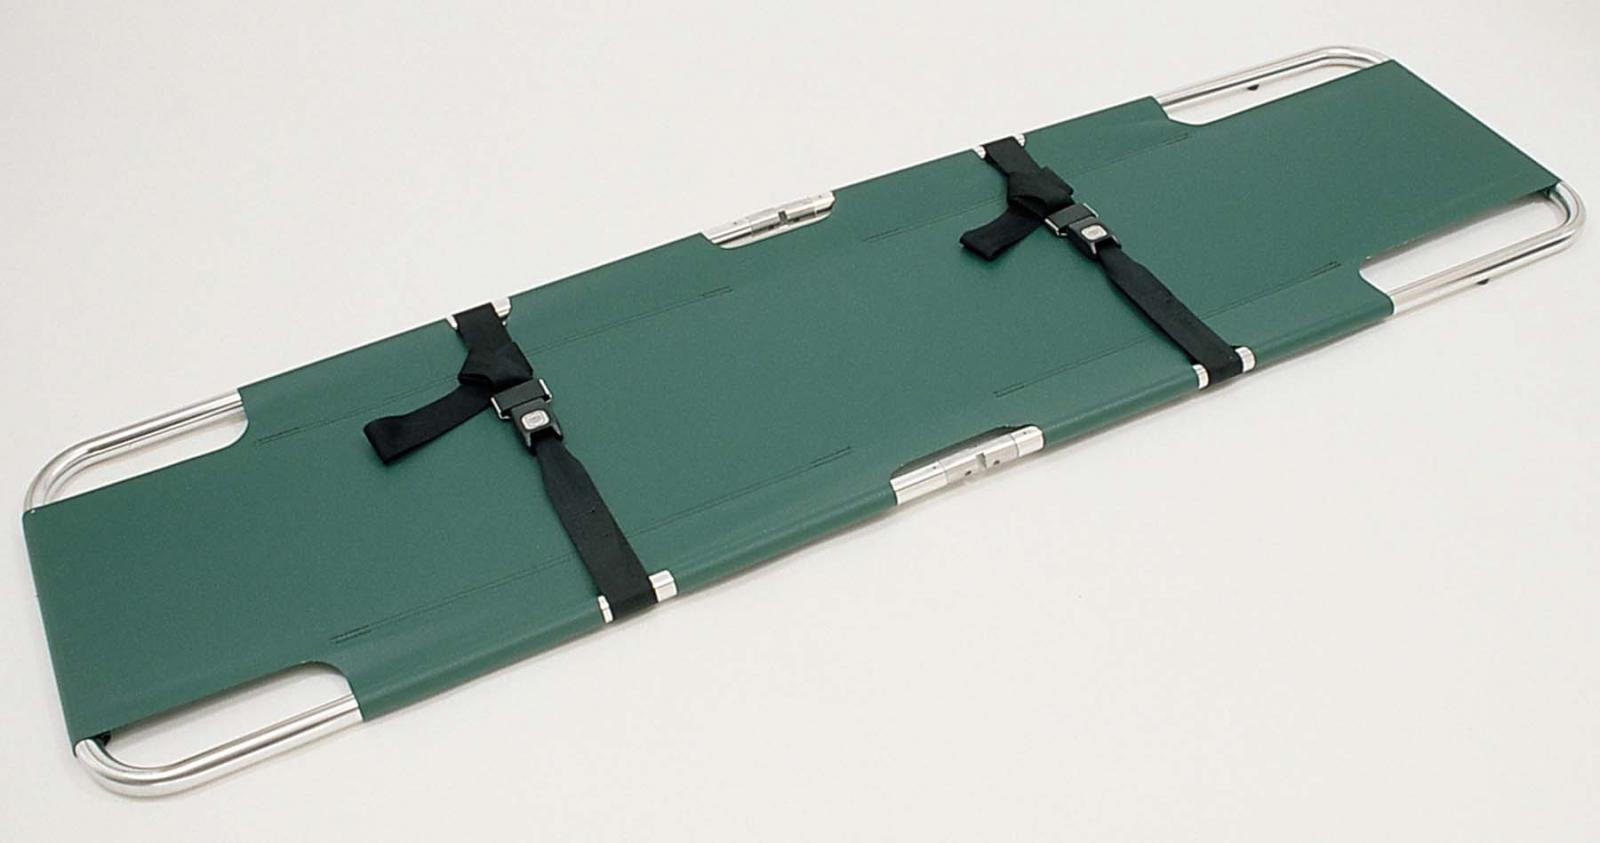 Portable stretcher